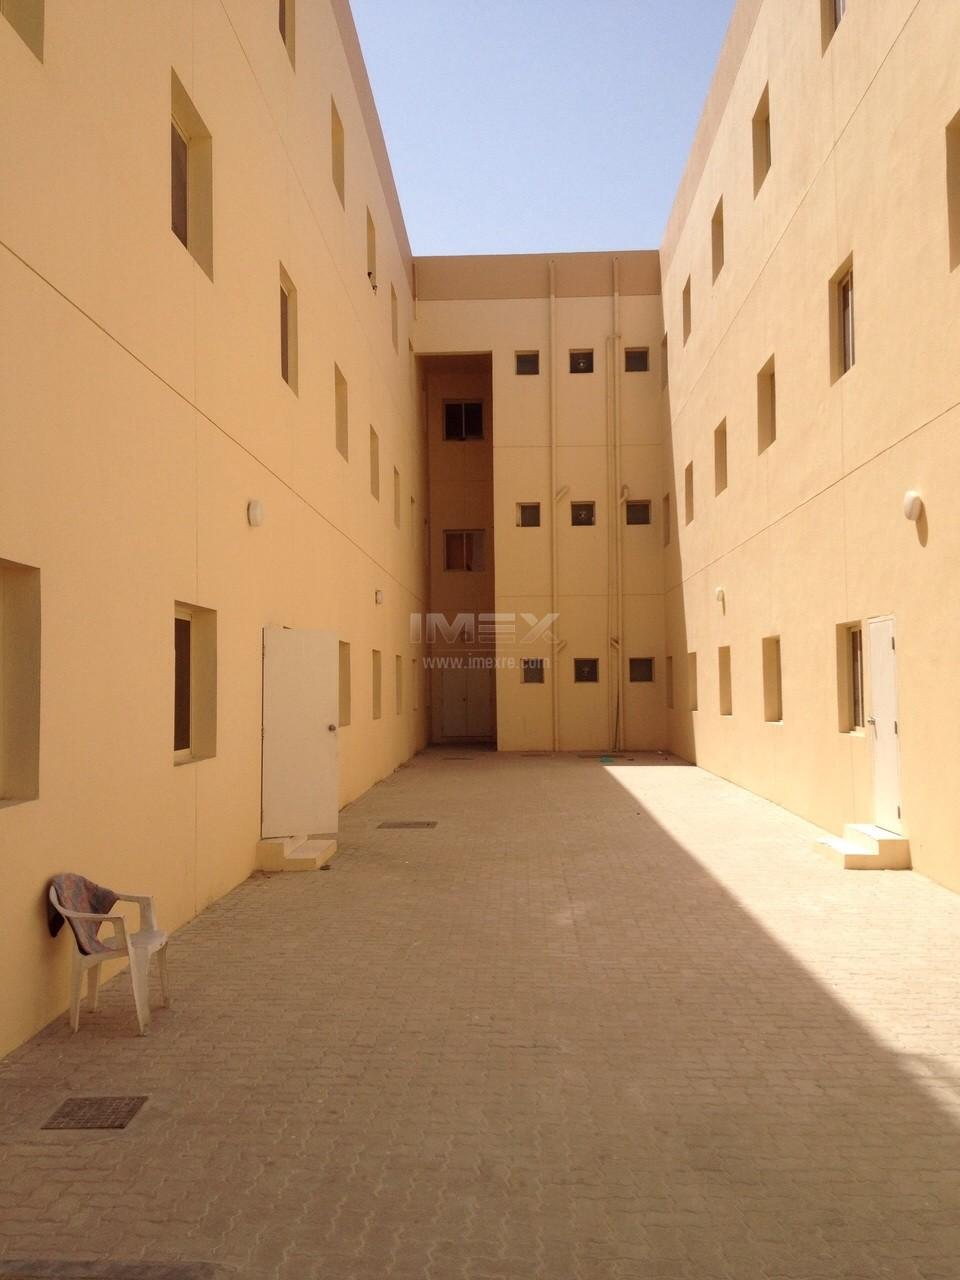 23-rooms-block-labour-camp-in-dip-1